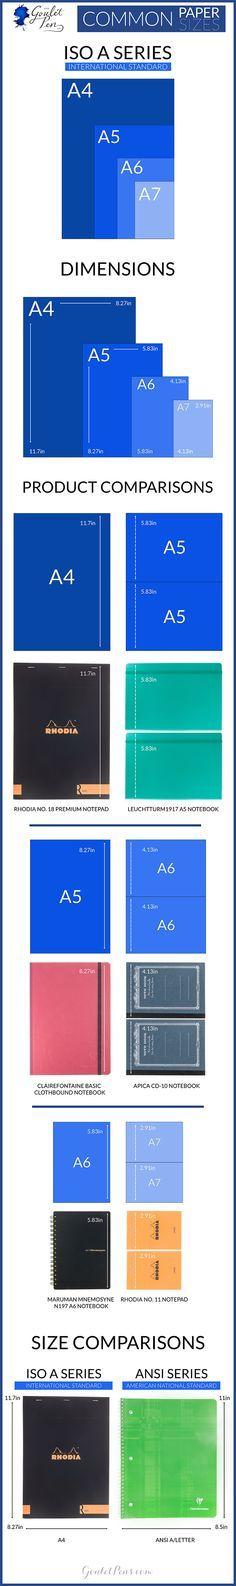 Goulet Pens Blog: Understanding Common Paper Sizes